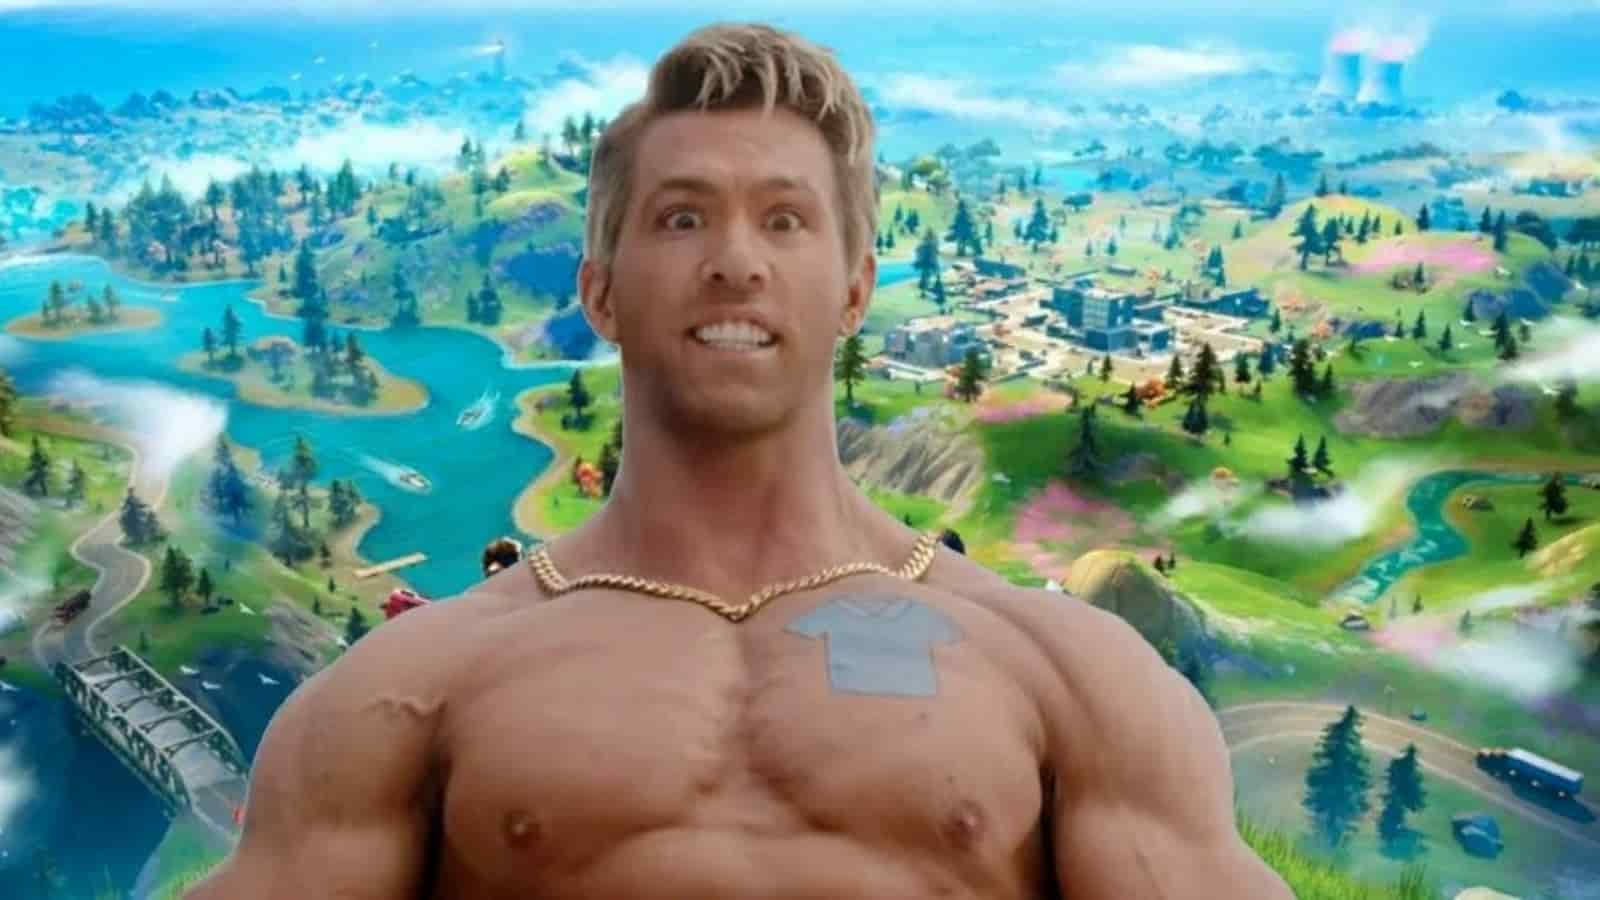 Fortnite Dude Skin: Ryan Reynolds Free Guy New Skin en la temporada 7